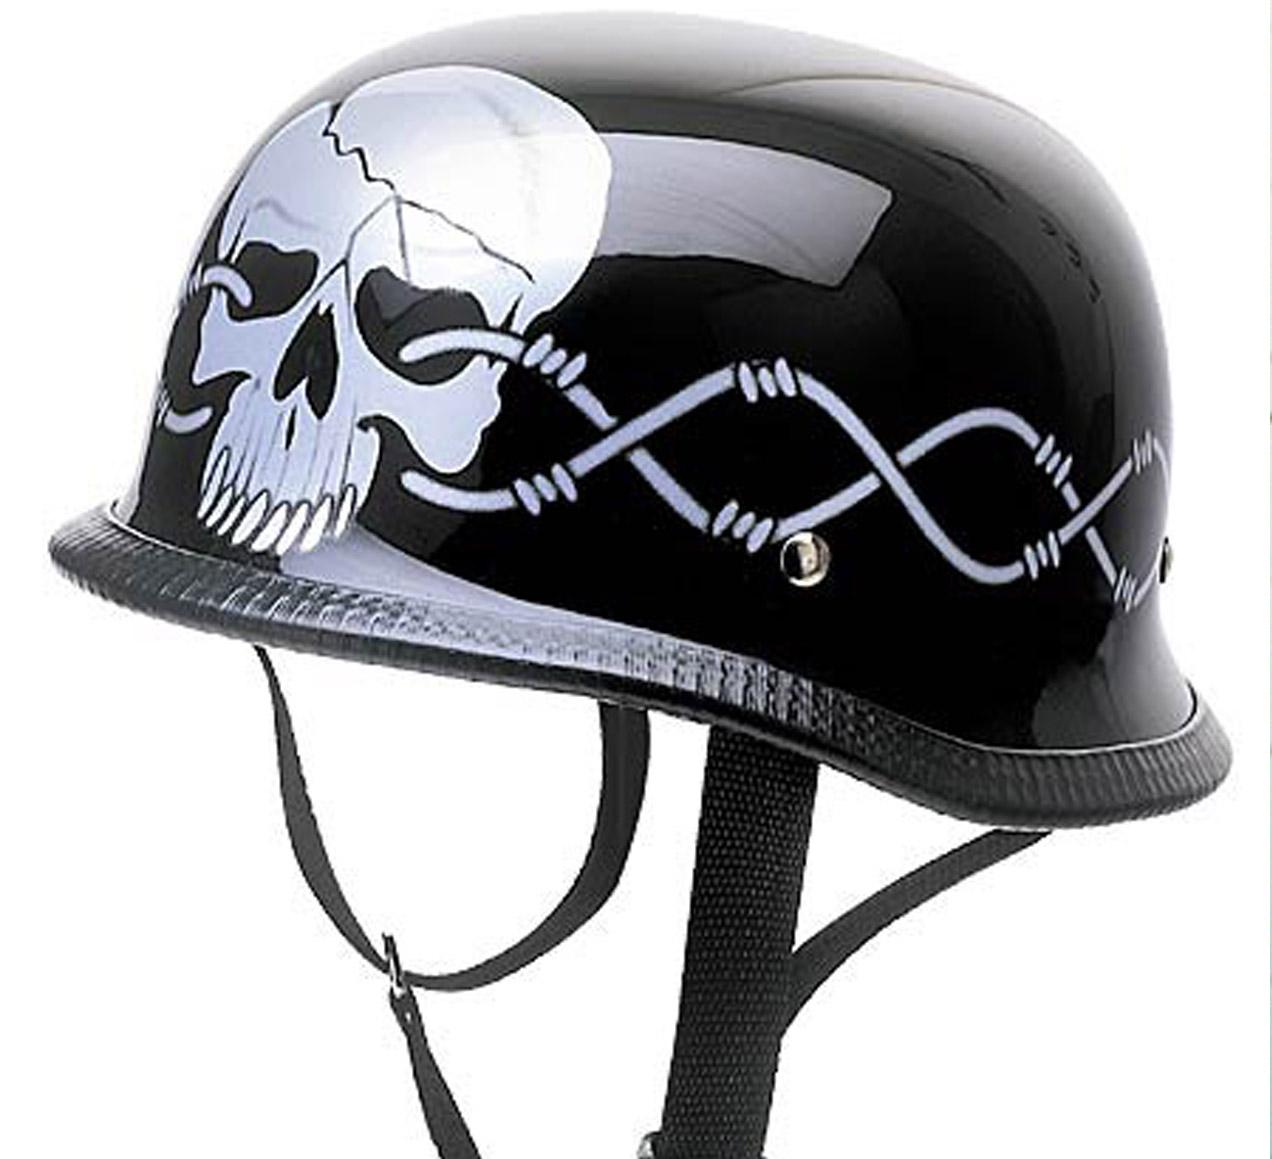 bad boys stuff rockers industries biker stuff. Black Bedroom Furniture Sets. Home Design Ideas